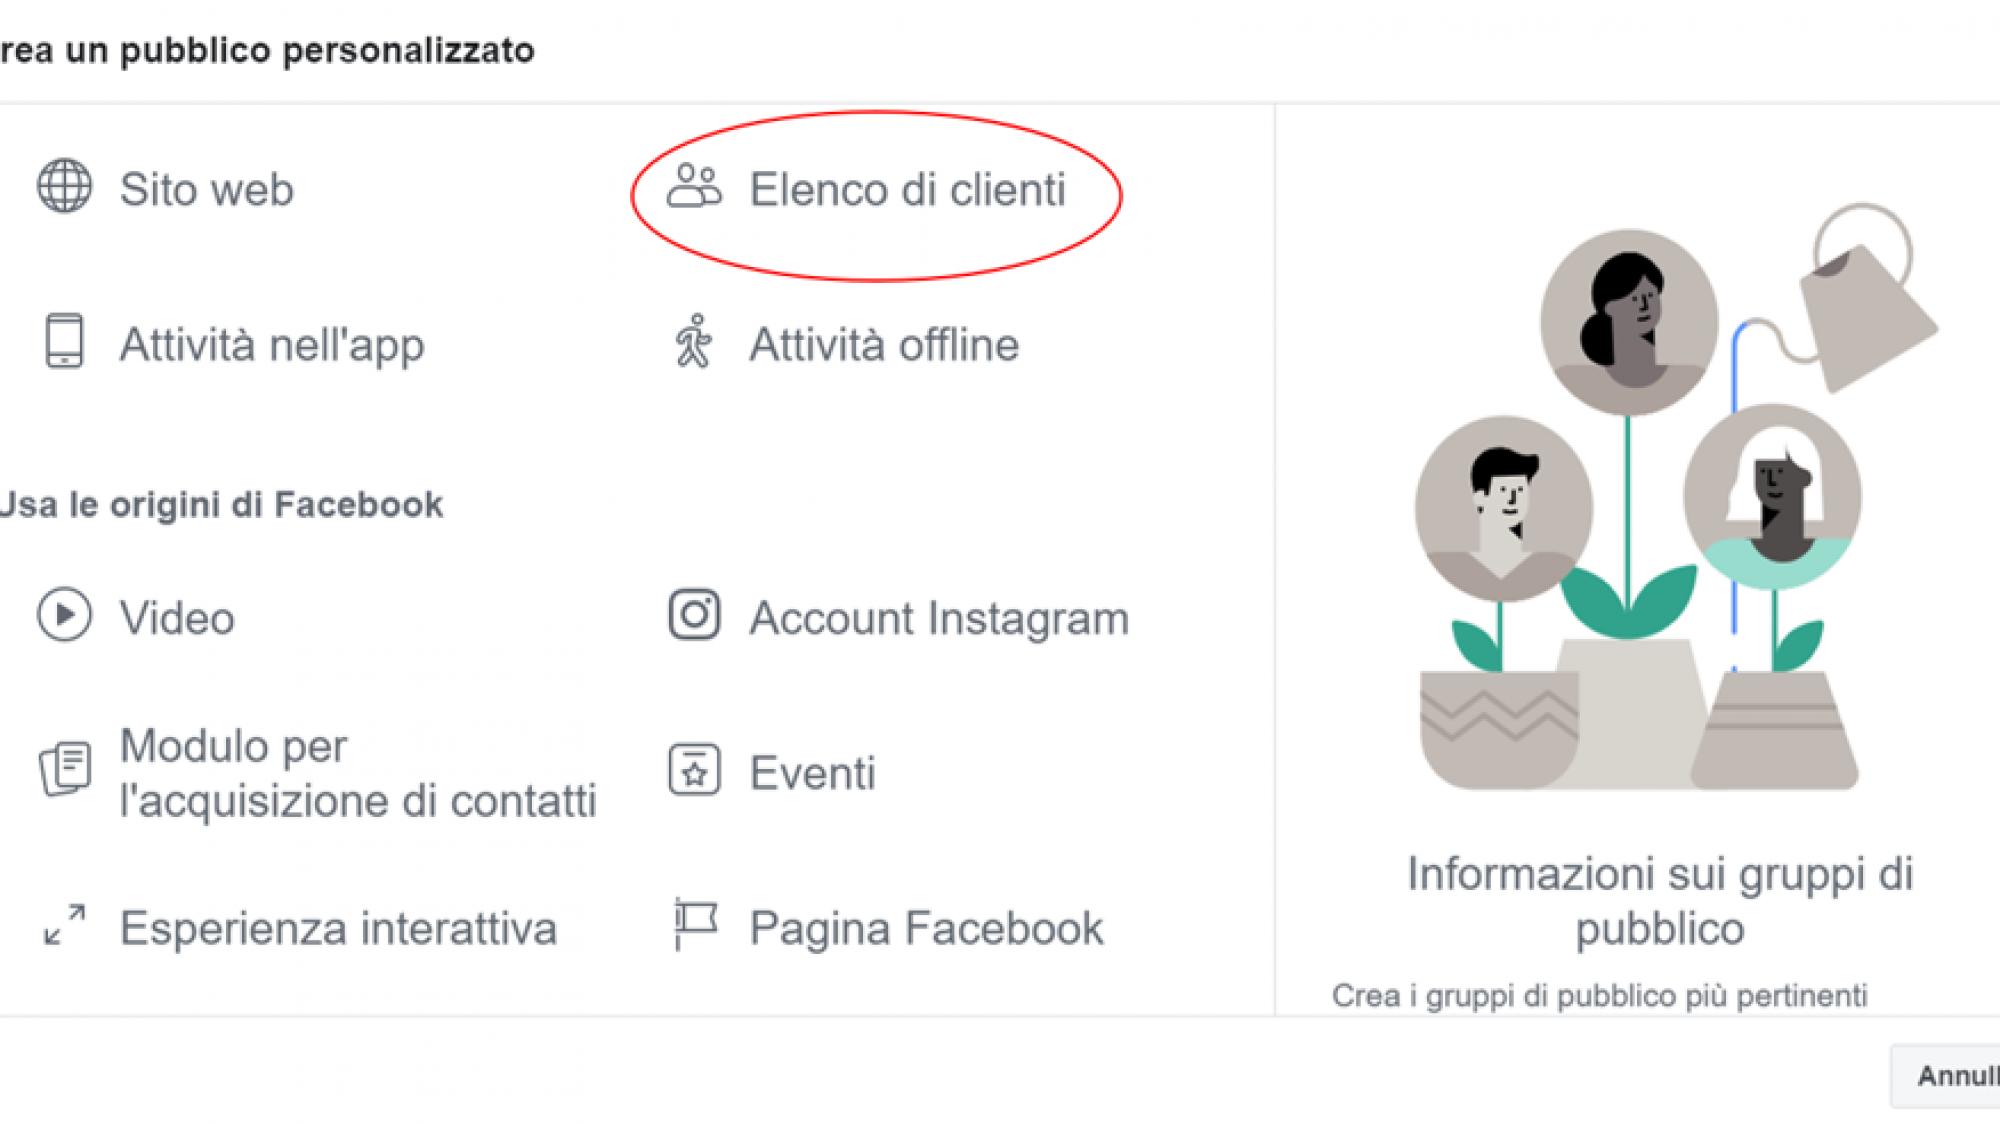 social media come si crea una campagna con pubblico personalizzato su Facebook/Instagram - Clink